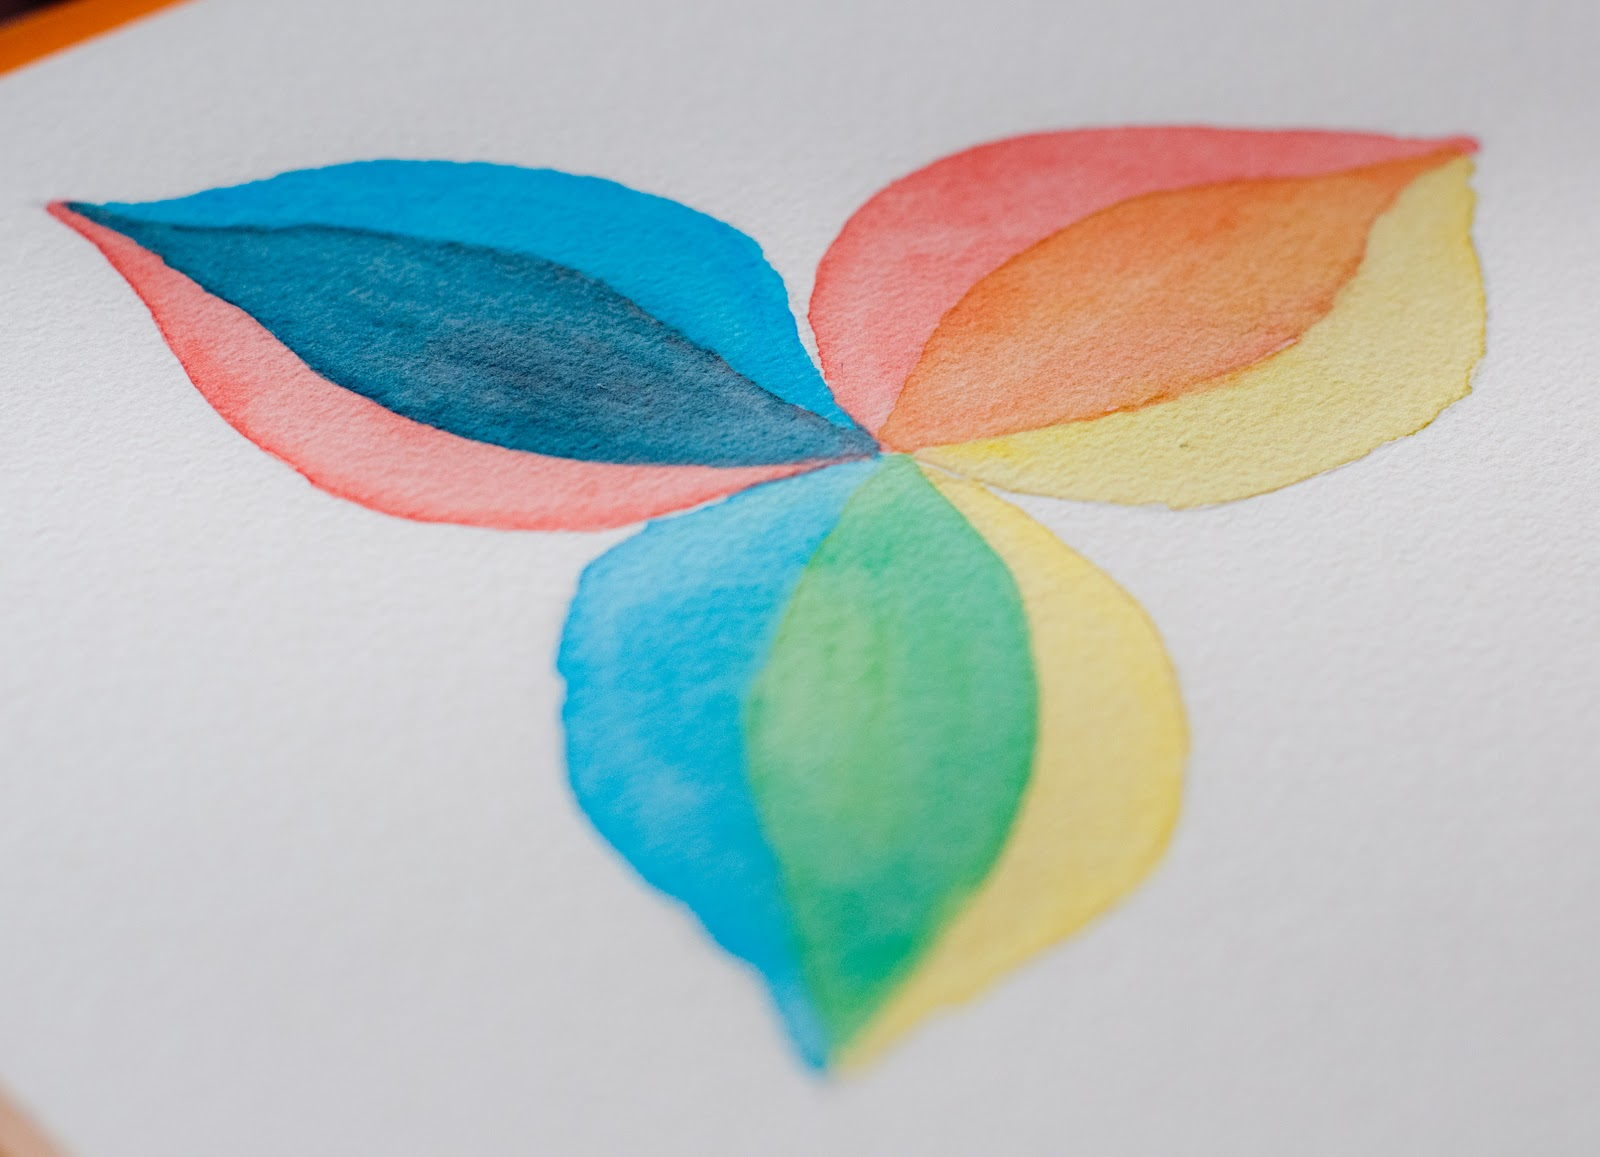 papelidades: Pintar con Acuarelas: Acuarela Seca.